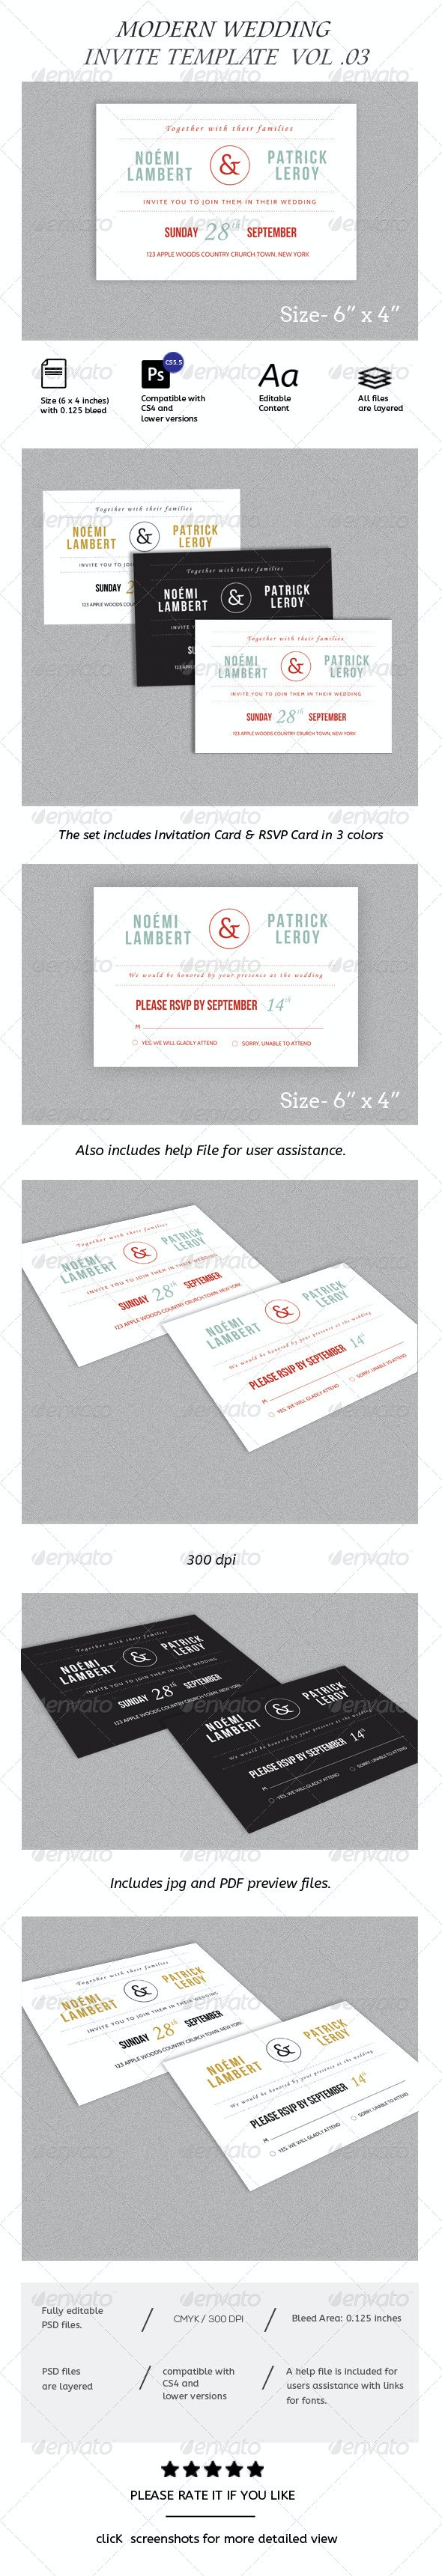 Simple Modern Wedding Invitation and RSVP Vol.03 - Weddings Cards & Invites